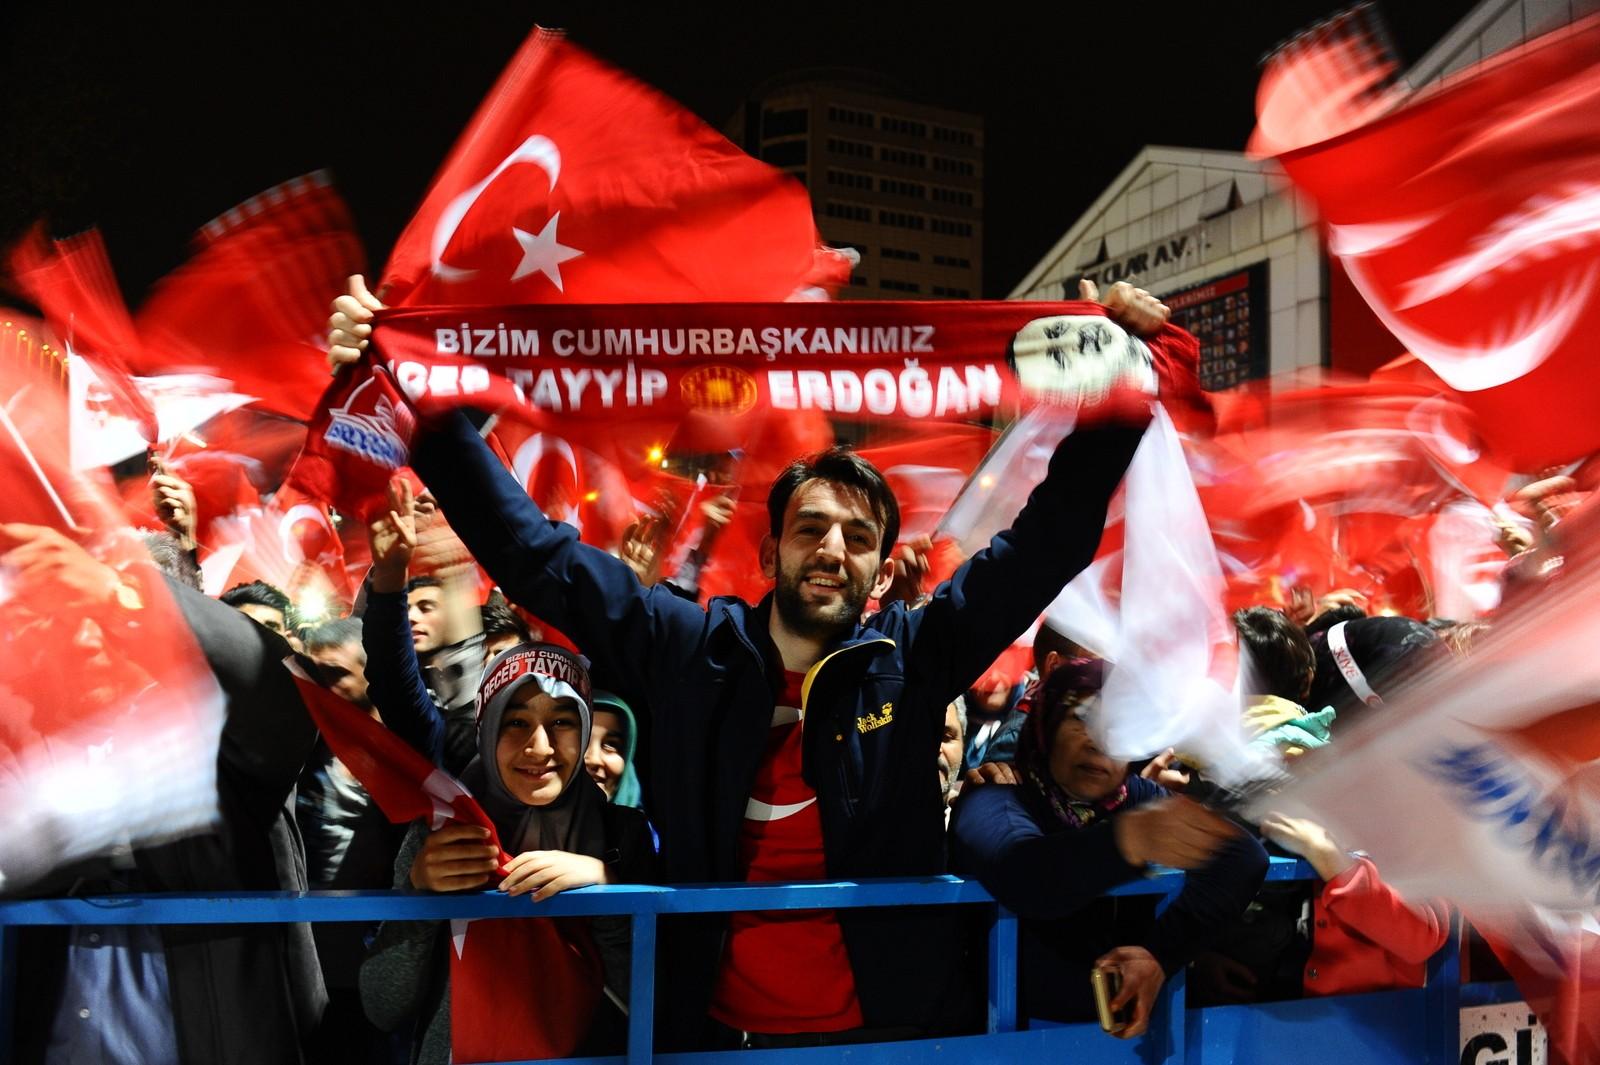 Bursa'da referandum sonucunu davul zurna ile kutladılar 2